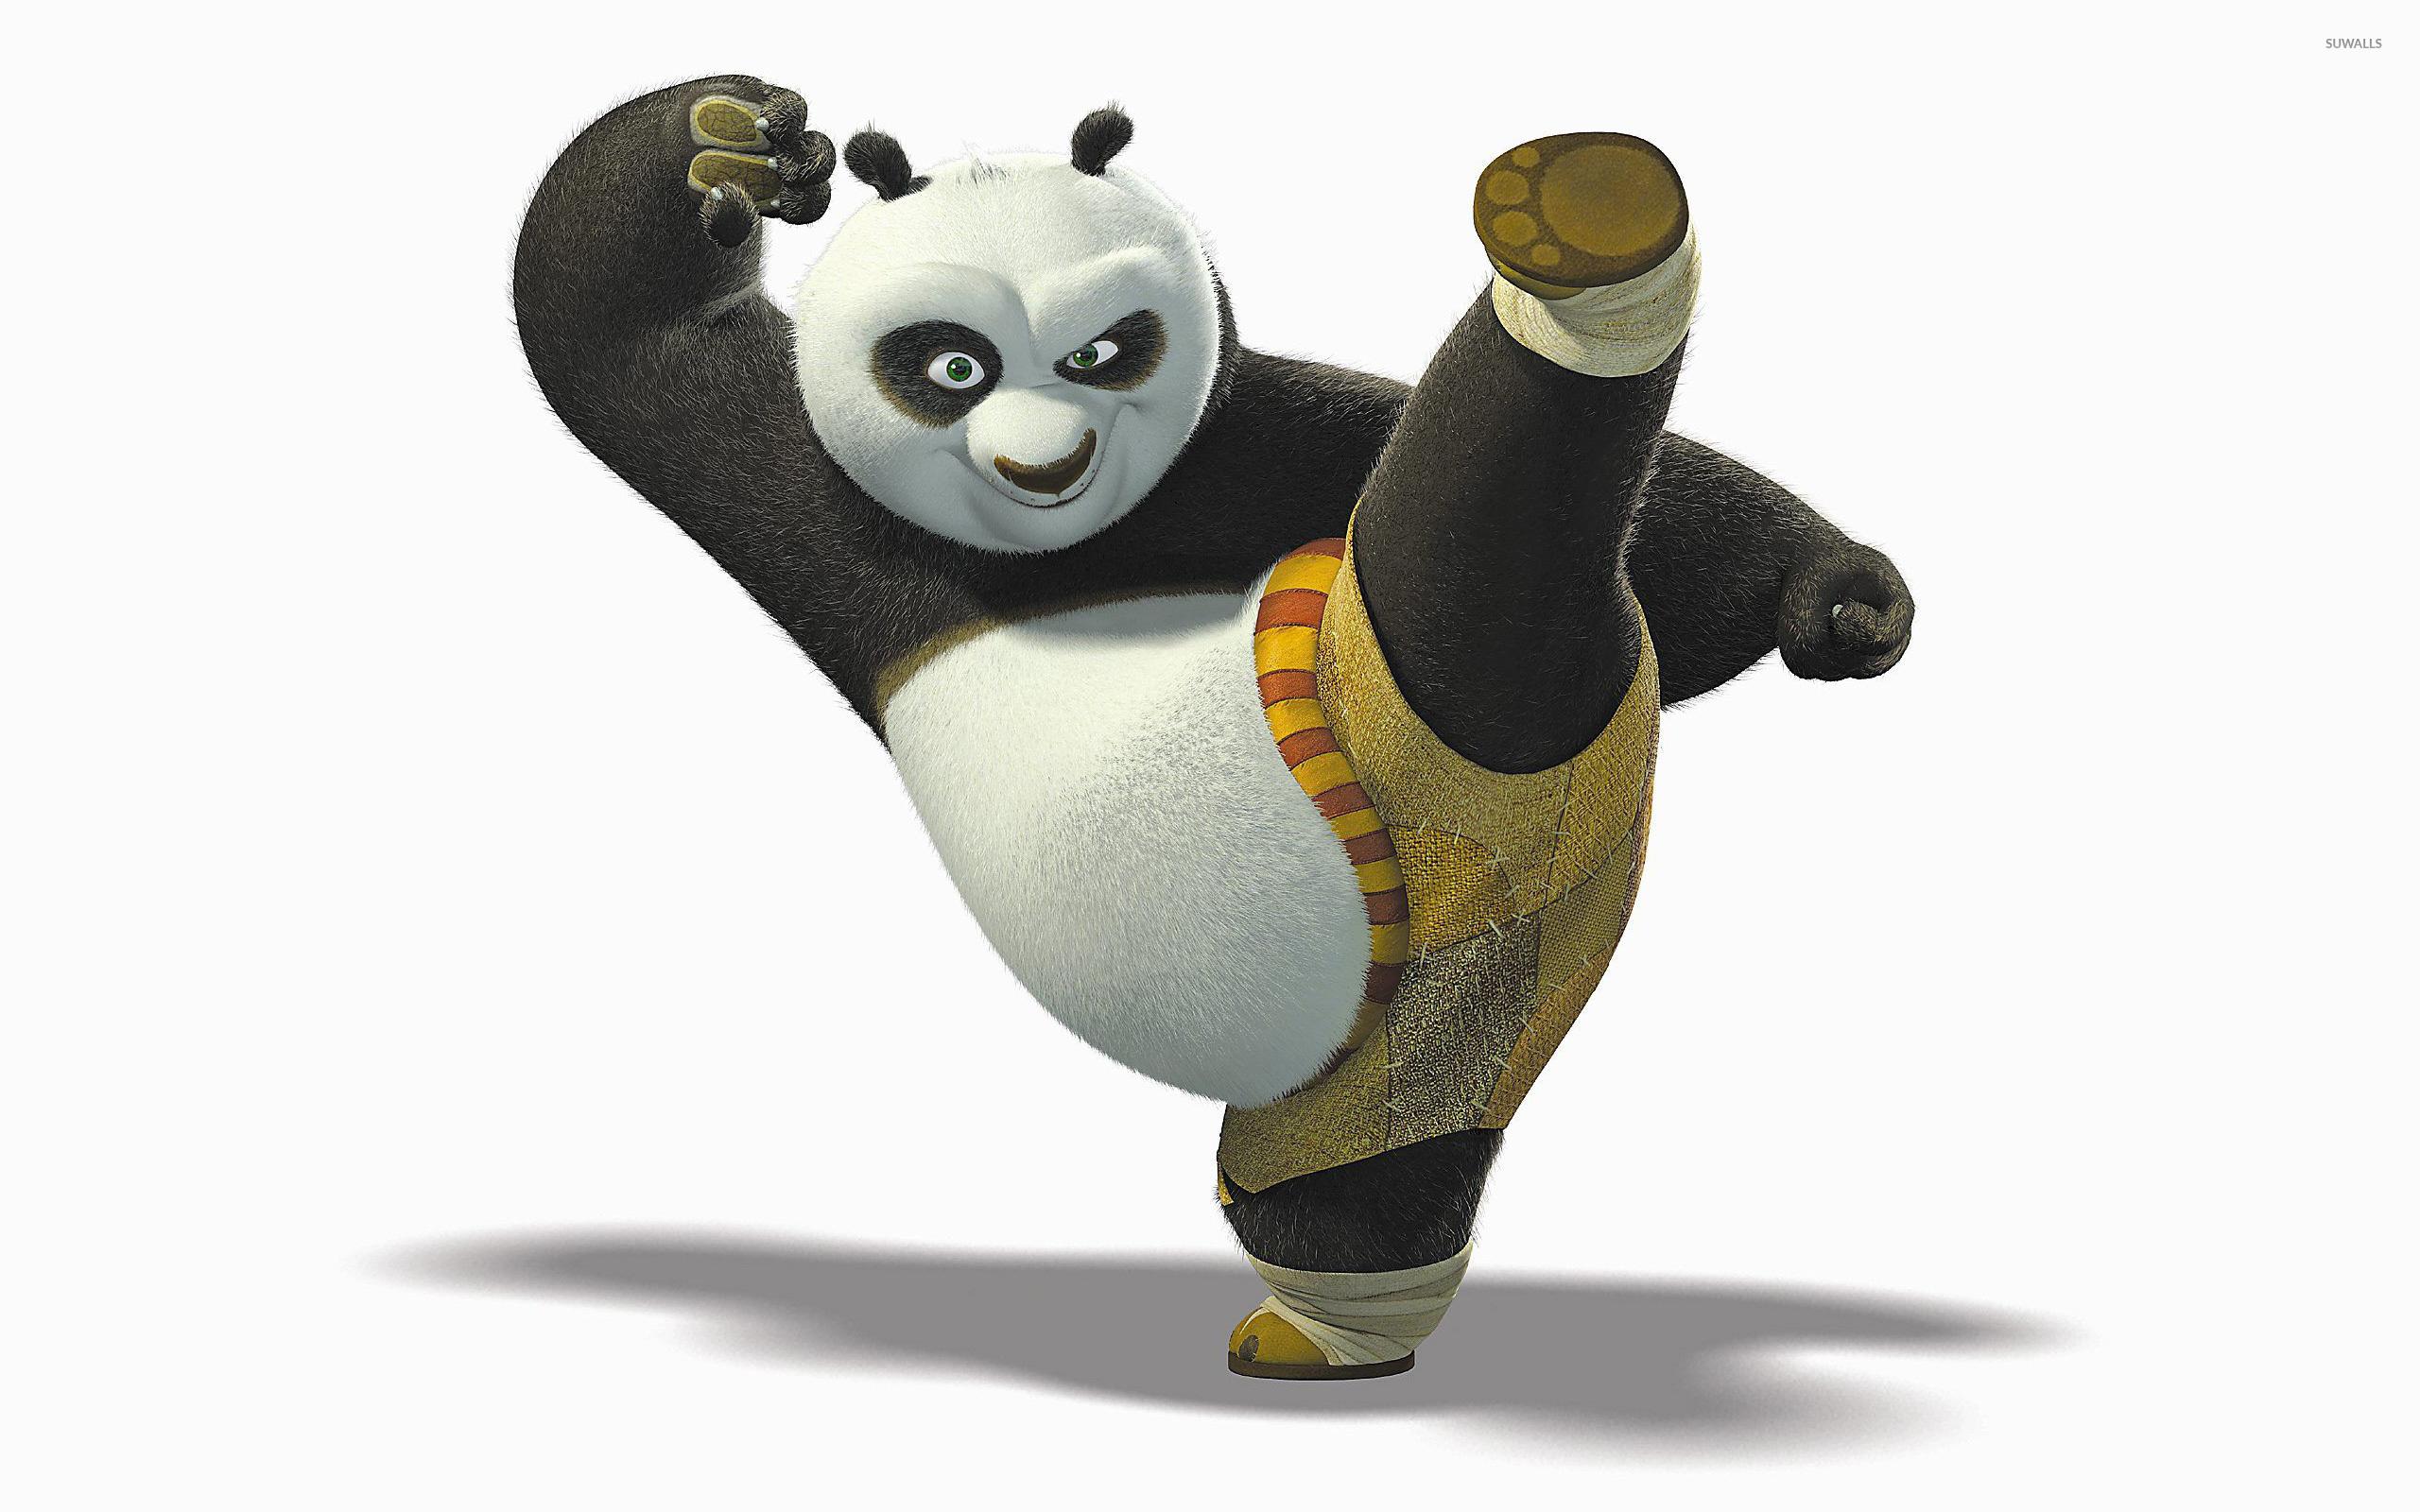 Kung Fu Panda 2 Wallpaper Cartoon Wallpapers 4032